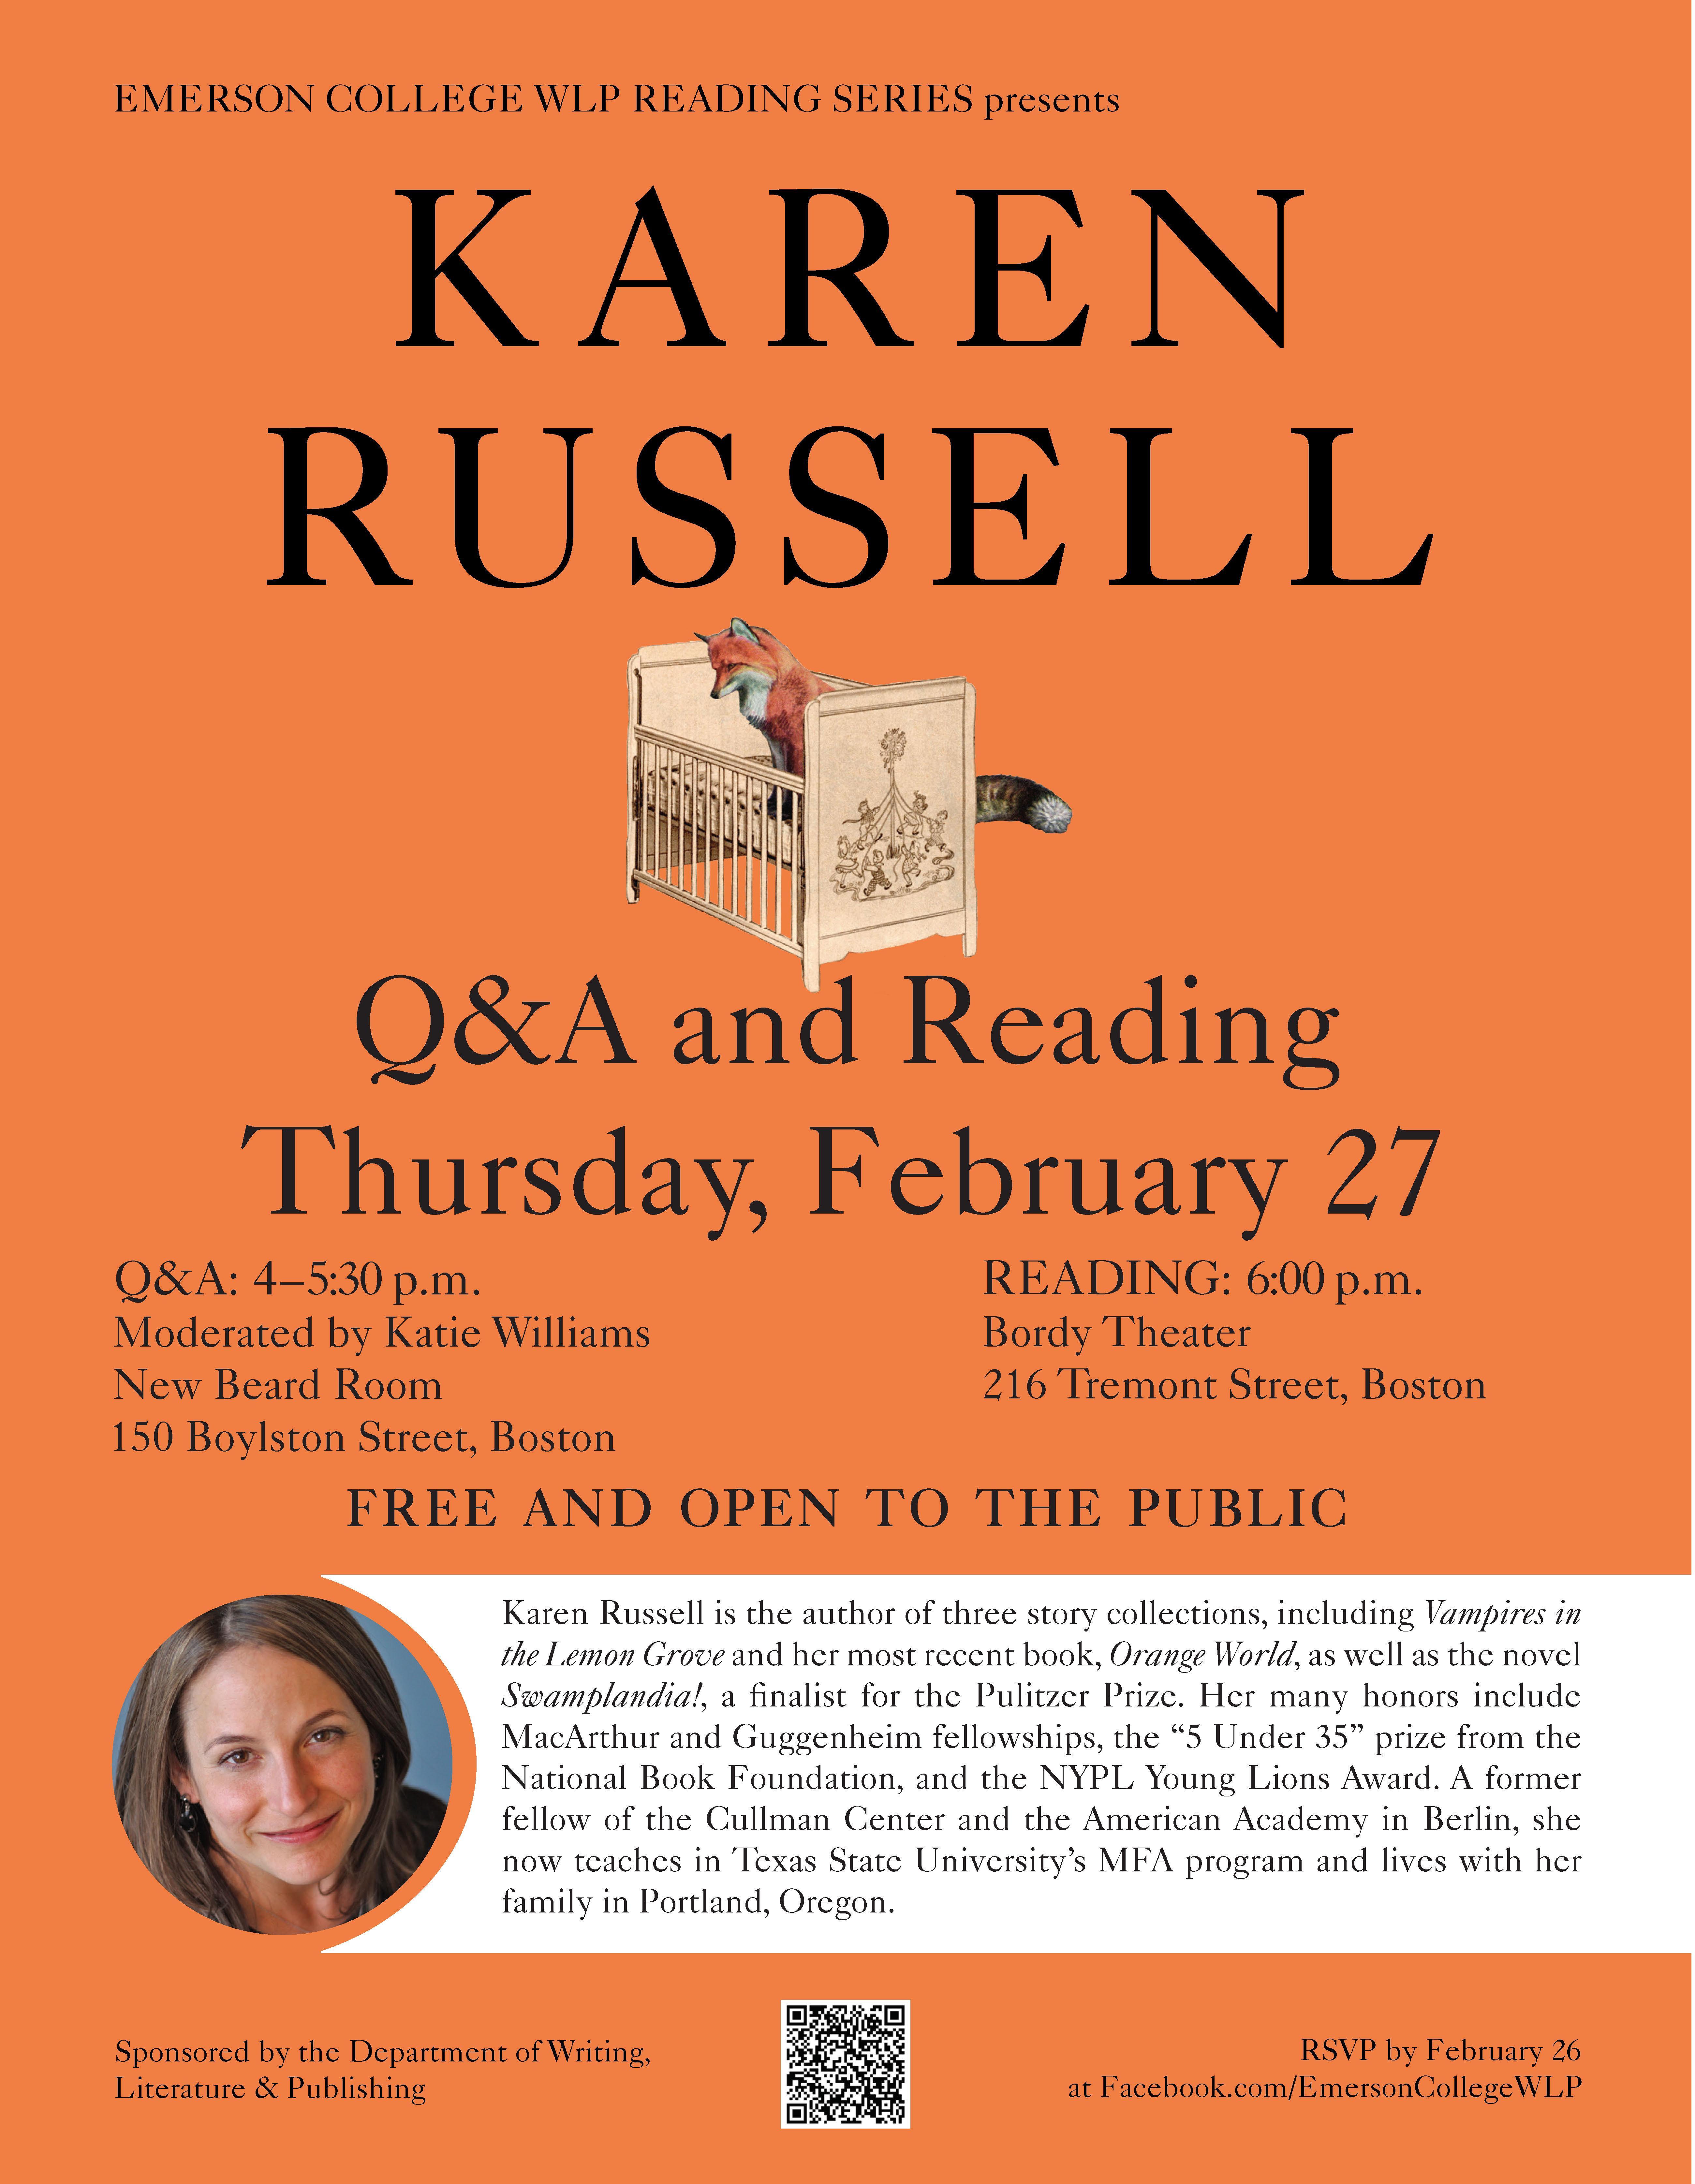 WLP Reading Series Reading: Karen Russell